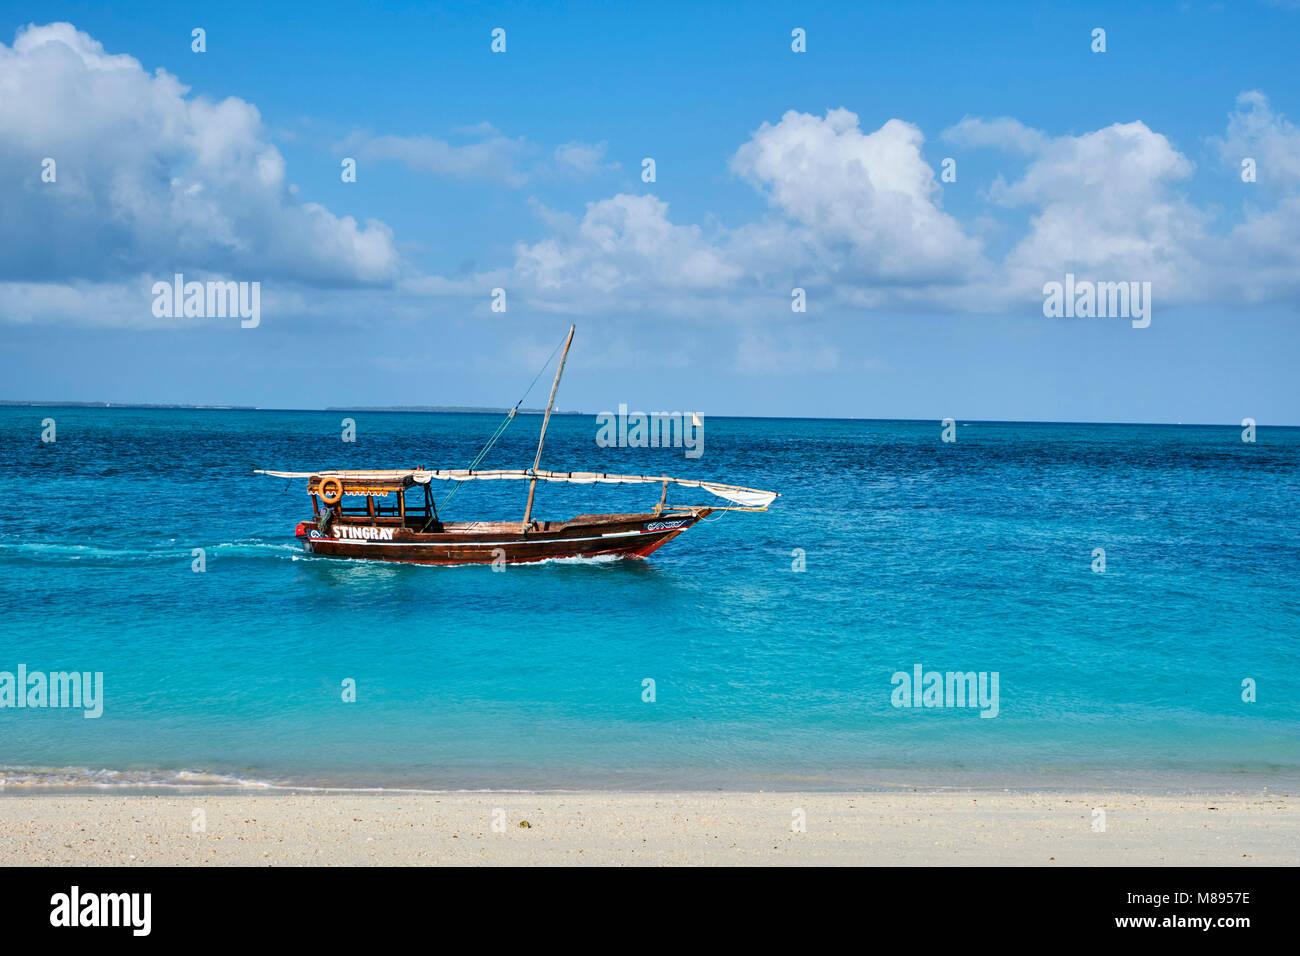 Tanzania, Zanzibar island, Unguja, Nungwi beach - Stock Image